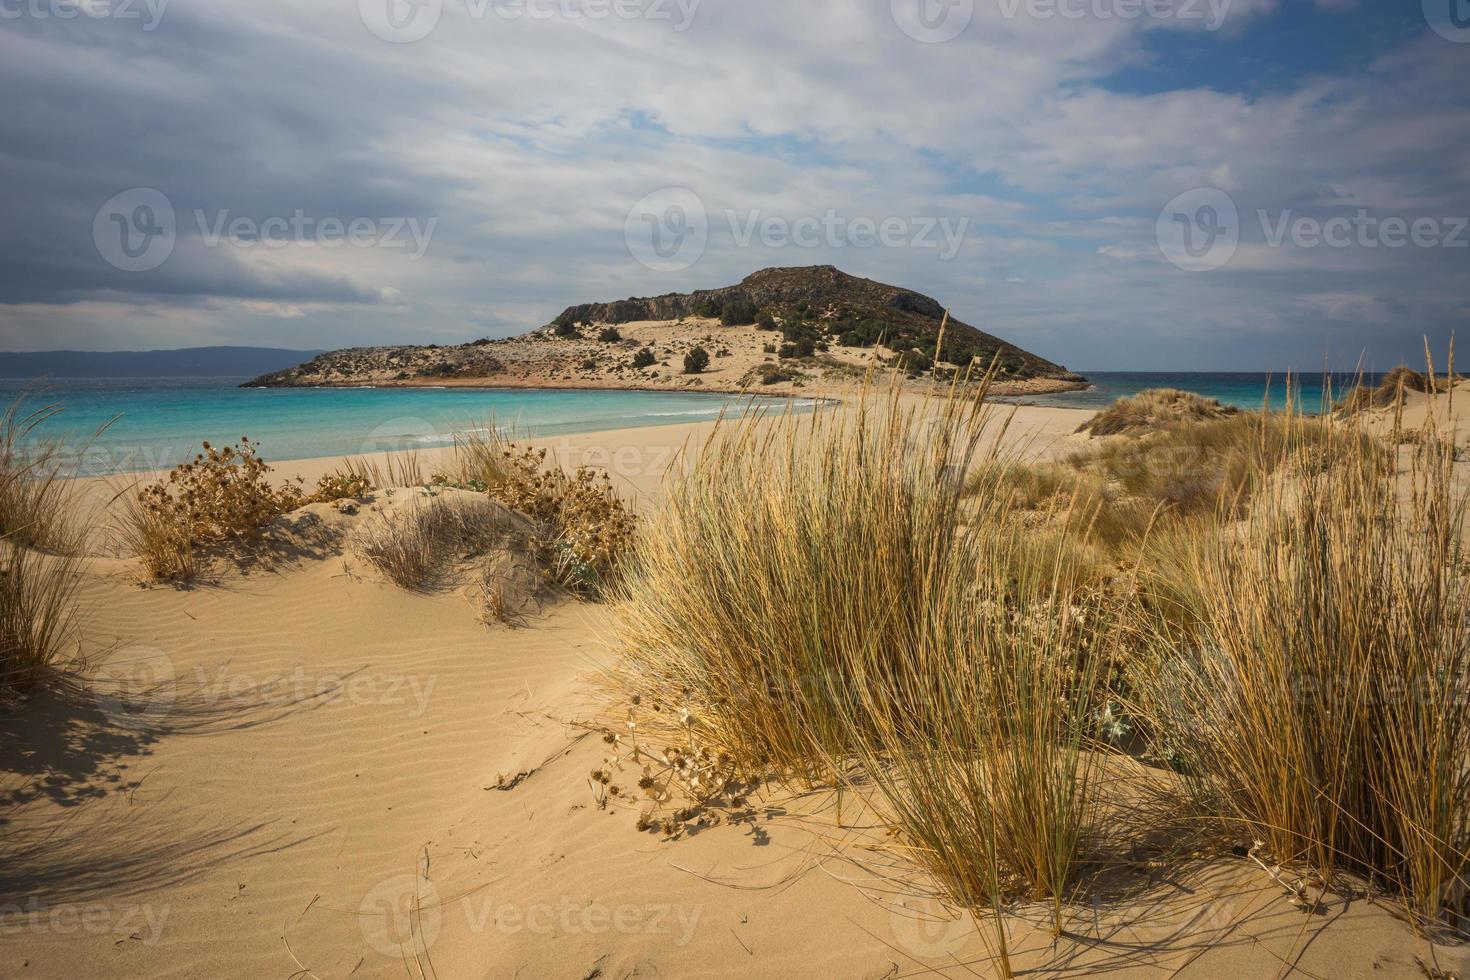 schmales Geflecht zur Halbinsel, Simos Beach, Elafonisos, Griechenland foto